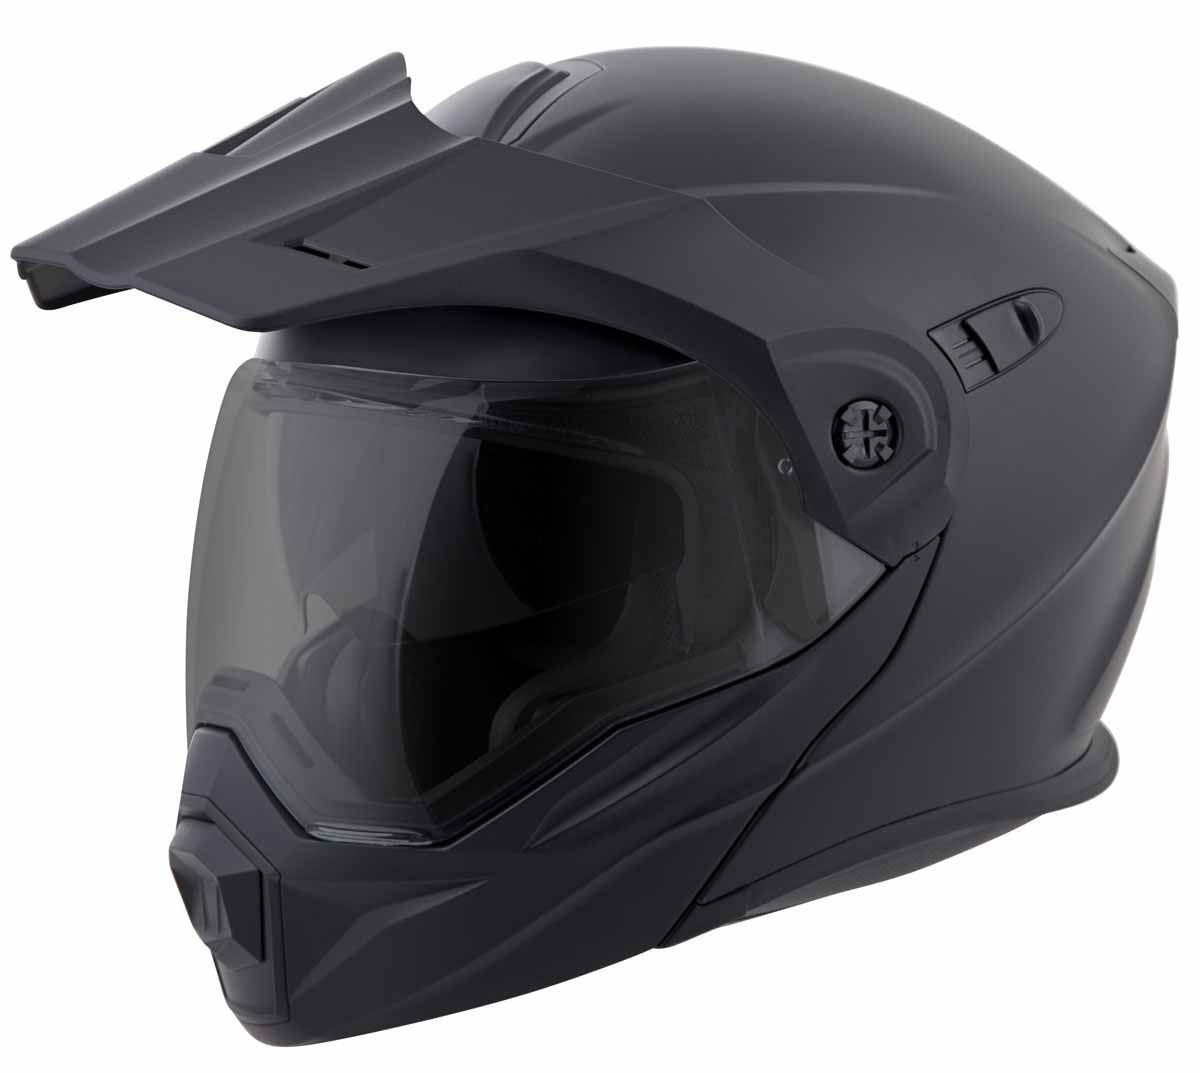 Scorpion-EXO-AT950-Helmet-Flip-Up-Modular-Dual-Sport-Adventure-ADV-DOT-XS-3XL miniature 6